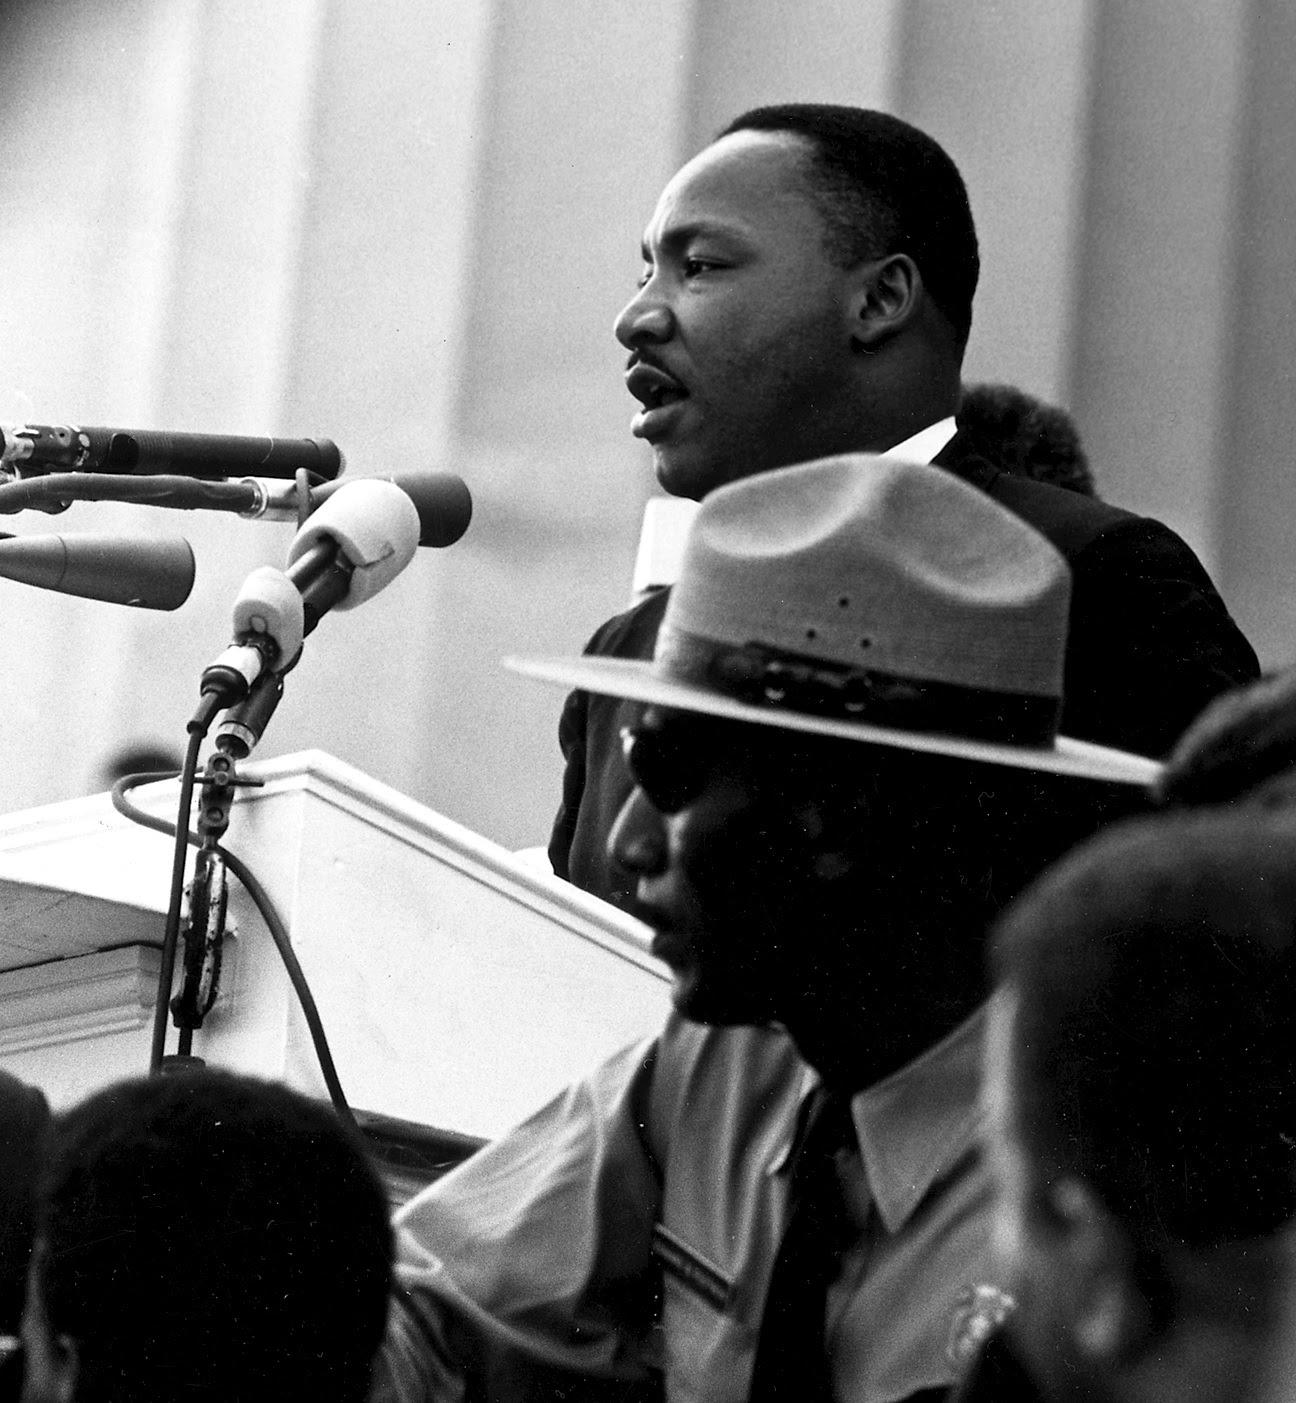 Ficheiro:Martin Luther King - March on Washington.jpg